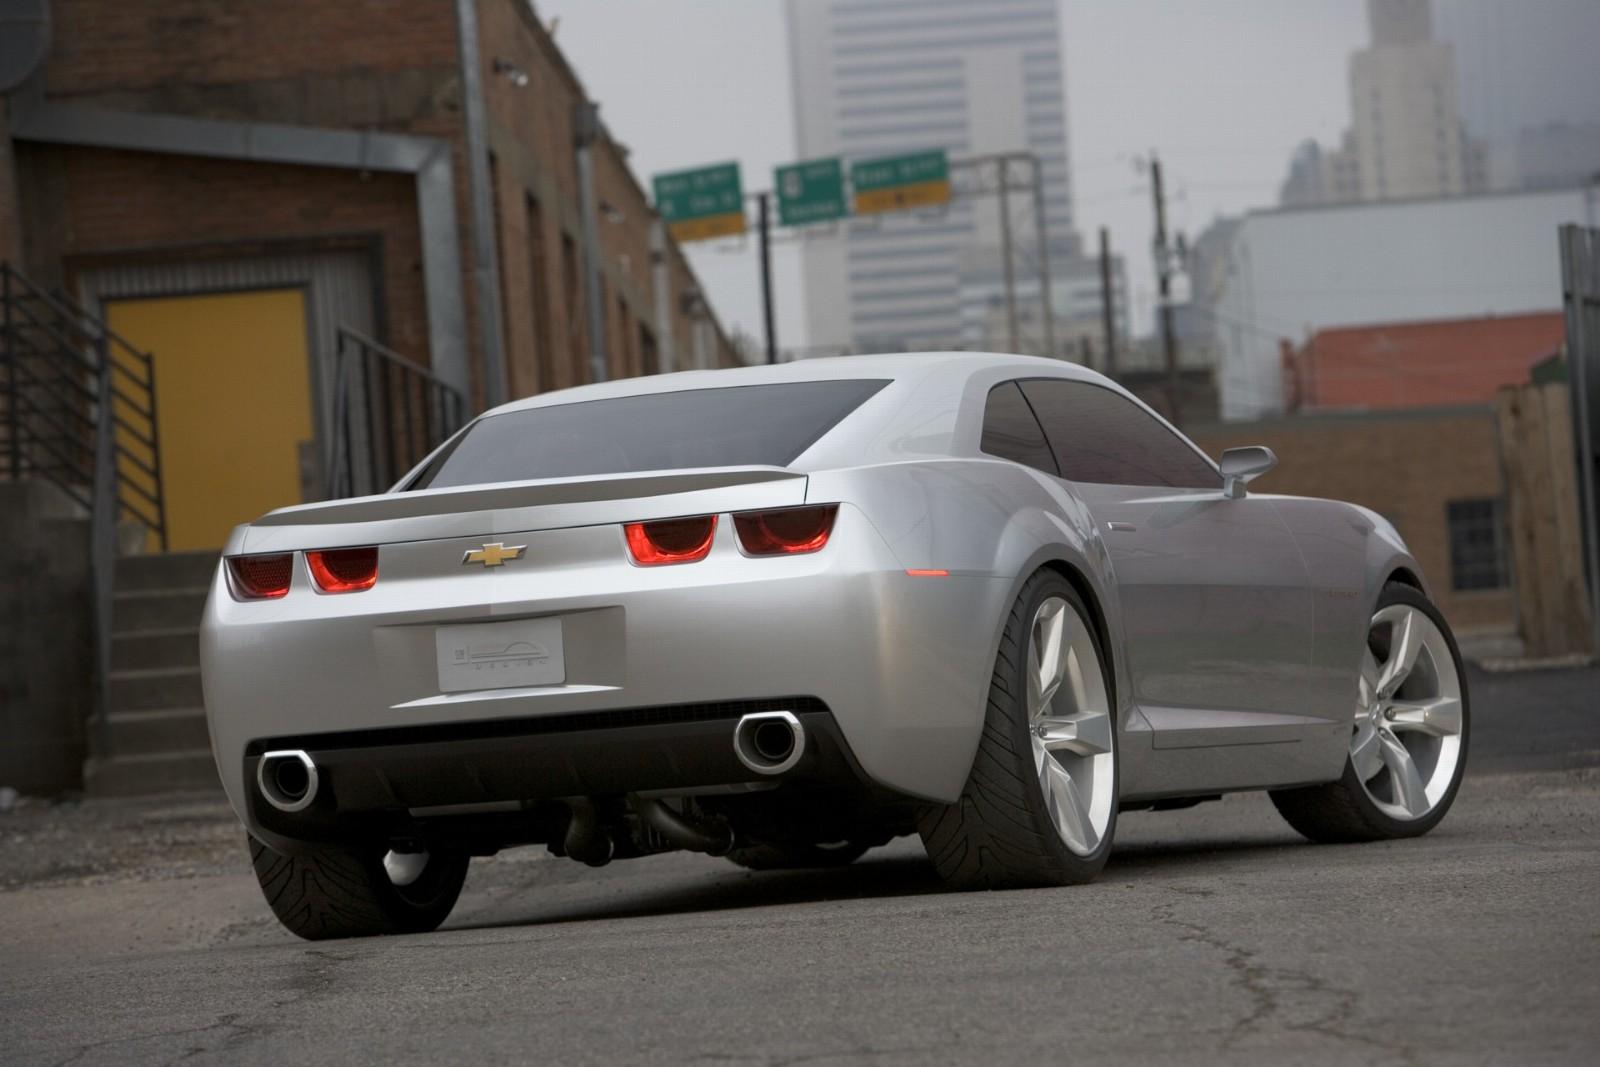 2006 Chevrolet Camaro Concept Image